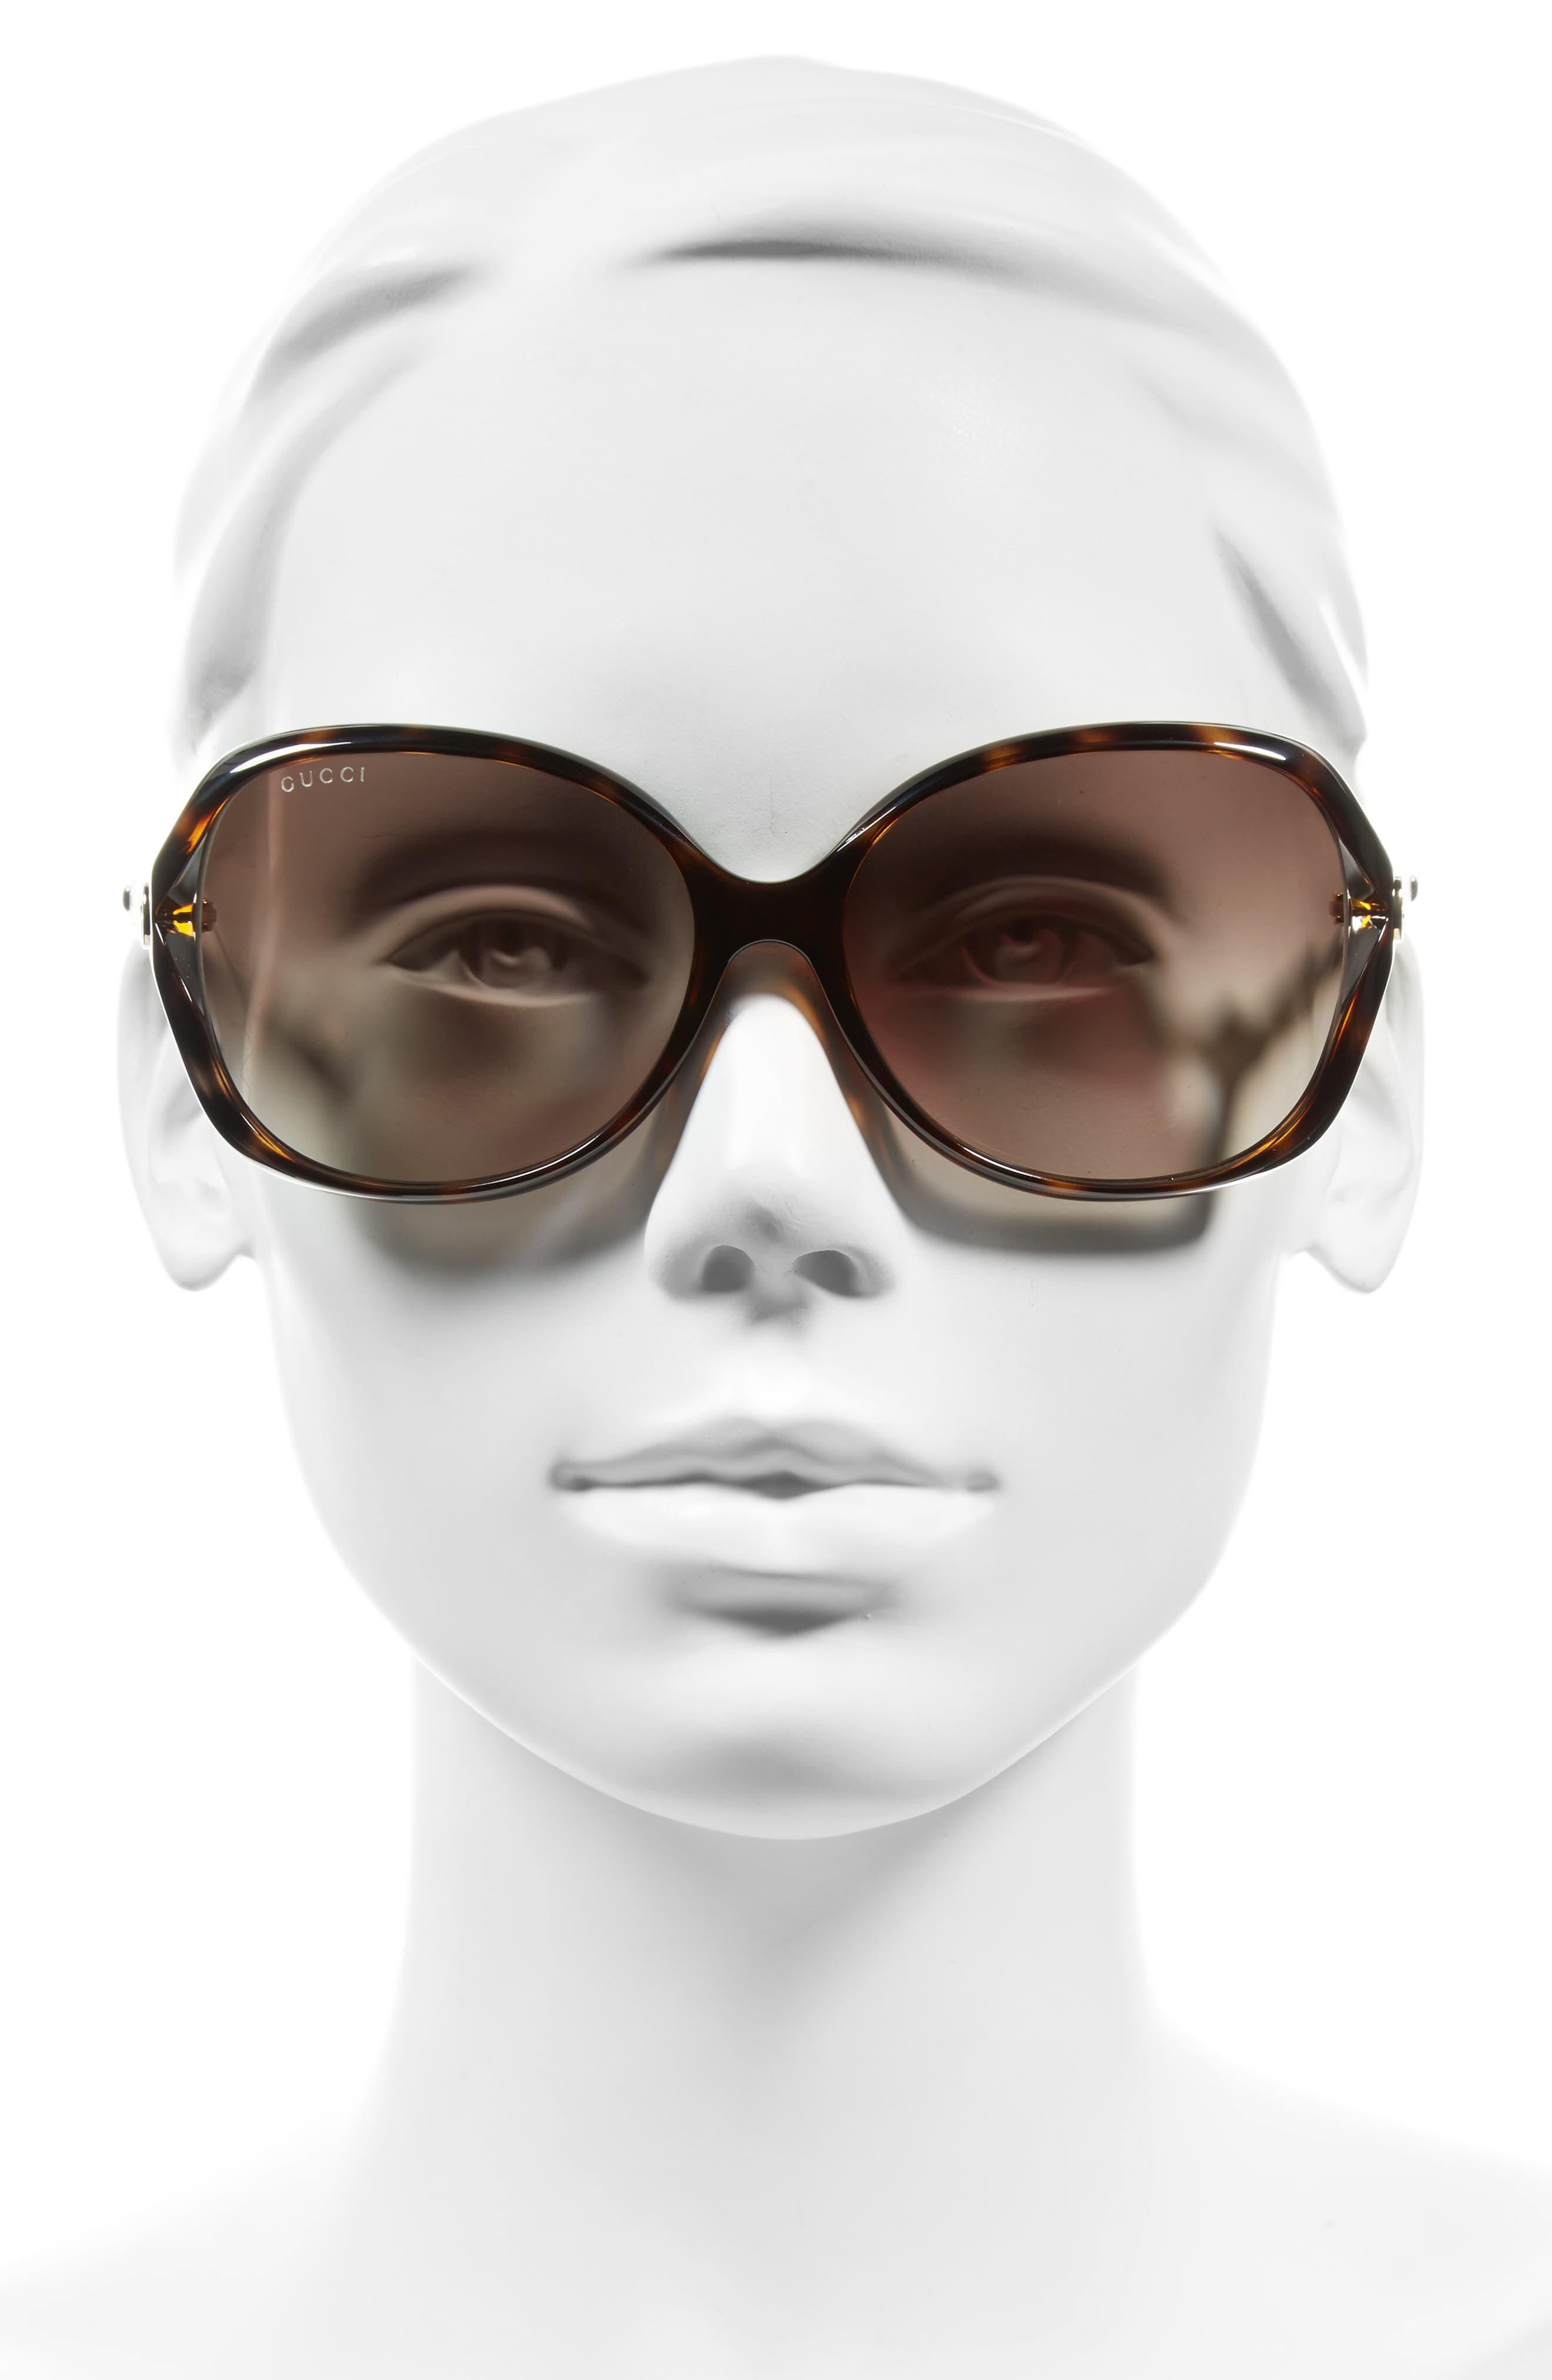 60mm Open Temple Oval Sunglasses,                             Alternate thumbnail 2, color,                             HAVANA/ BROWN